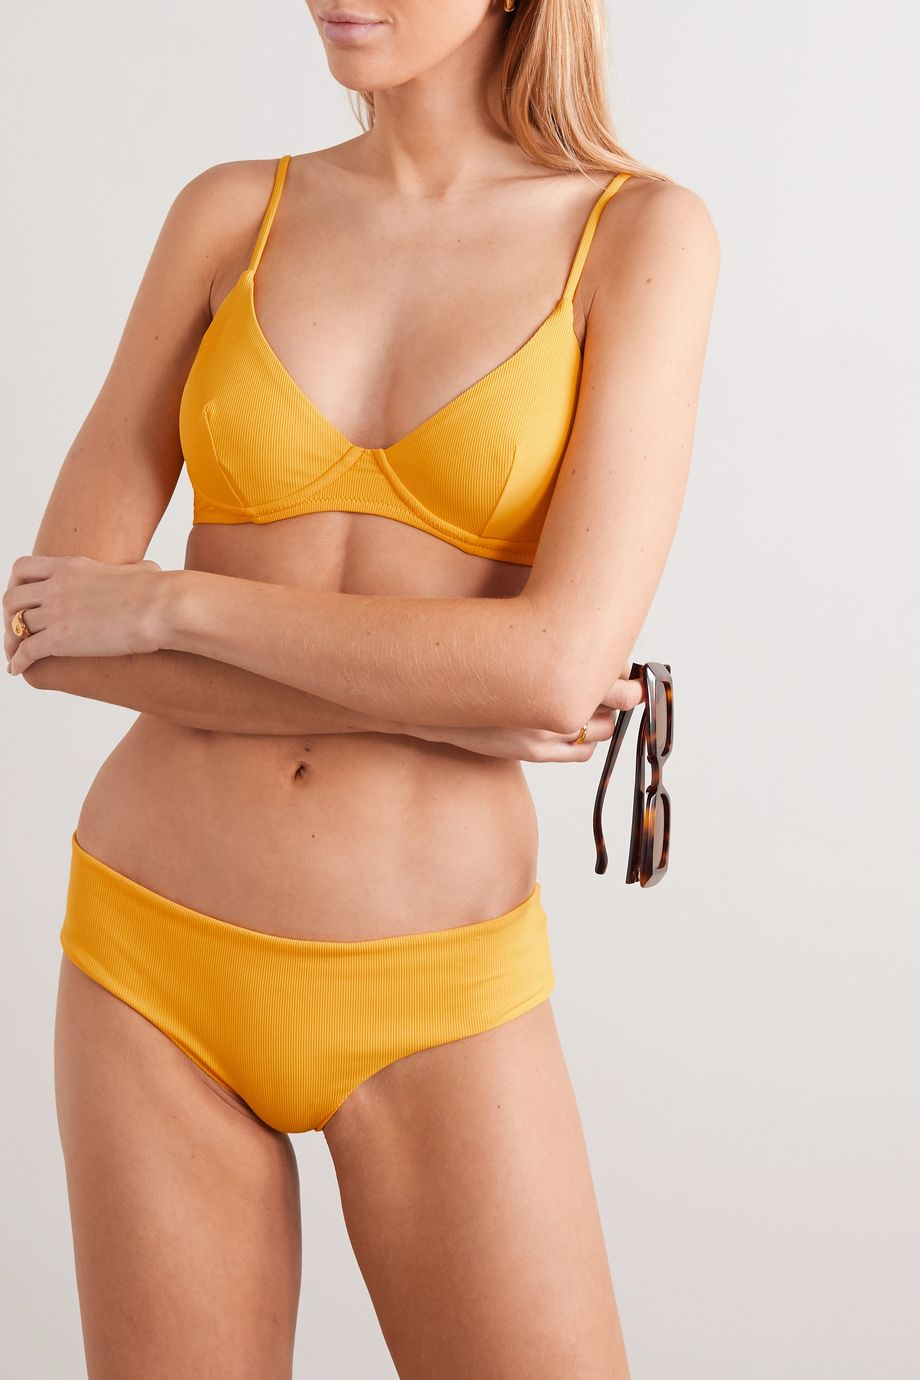 Les Girls Les Boys Ribbed underwired bikini